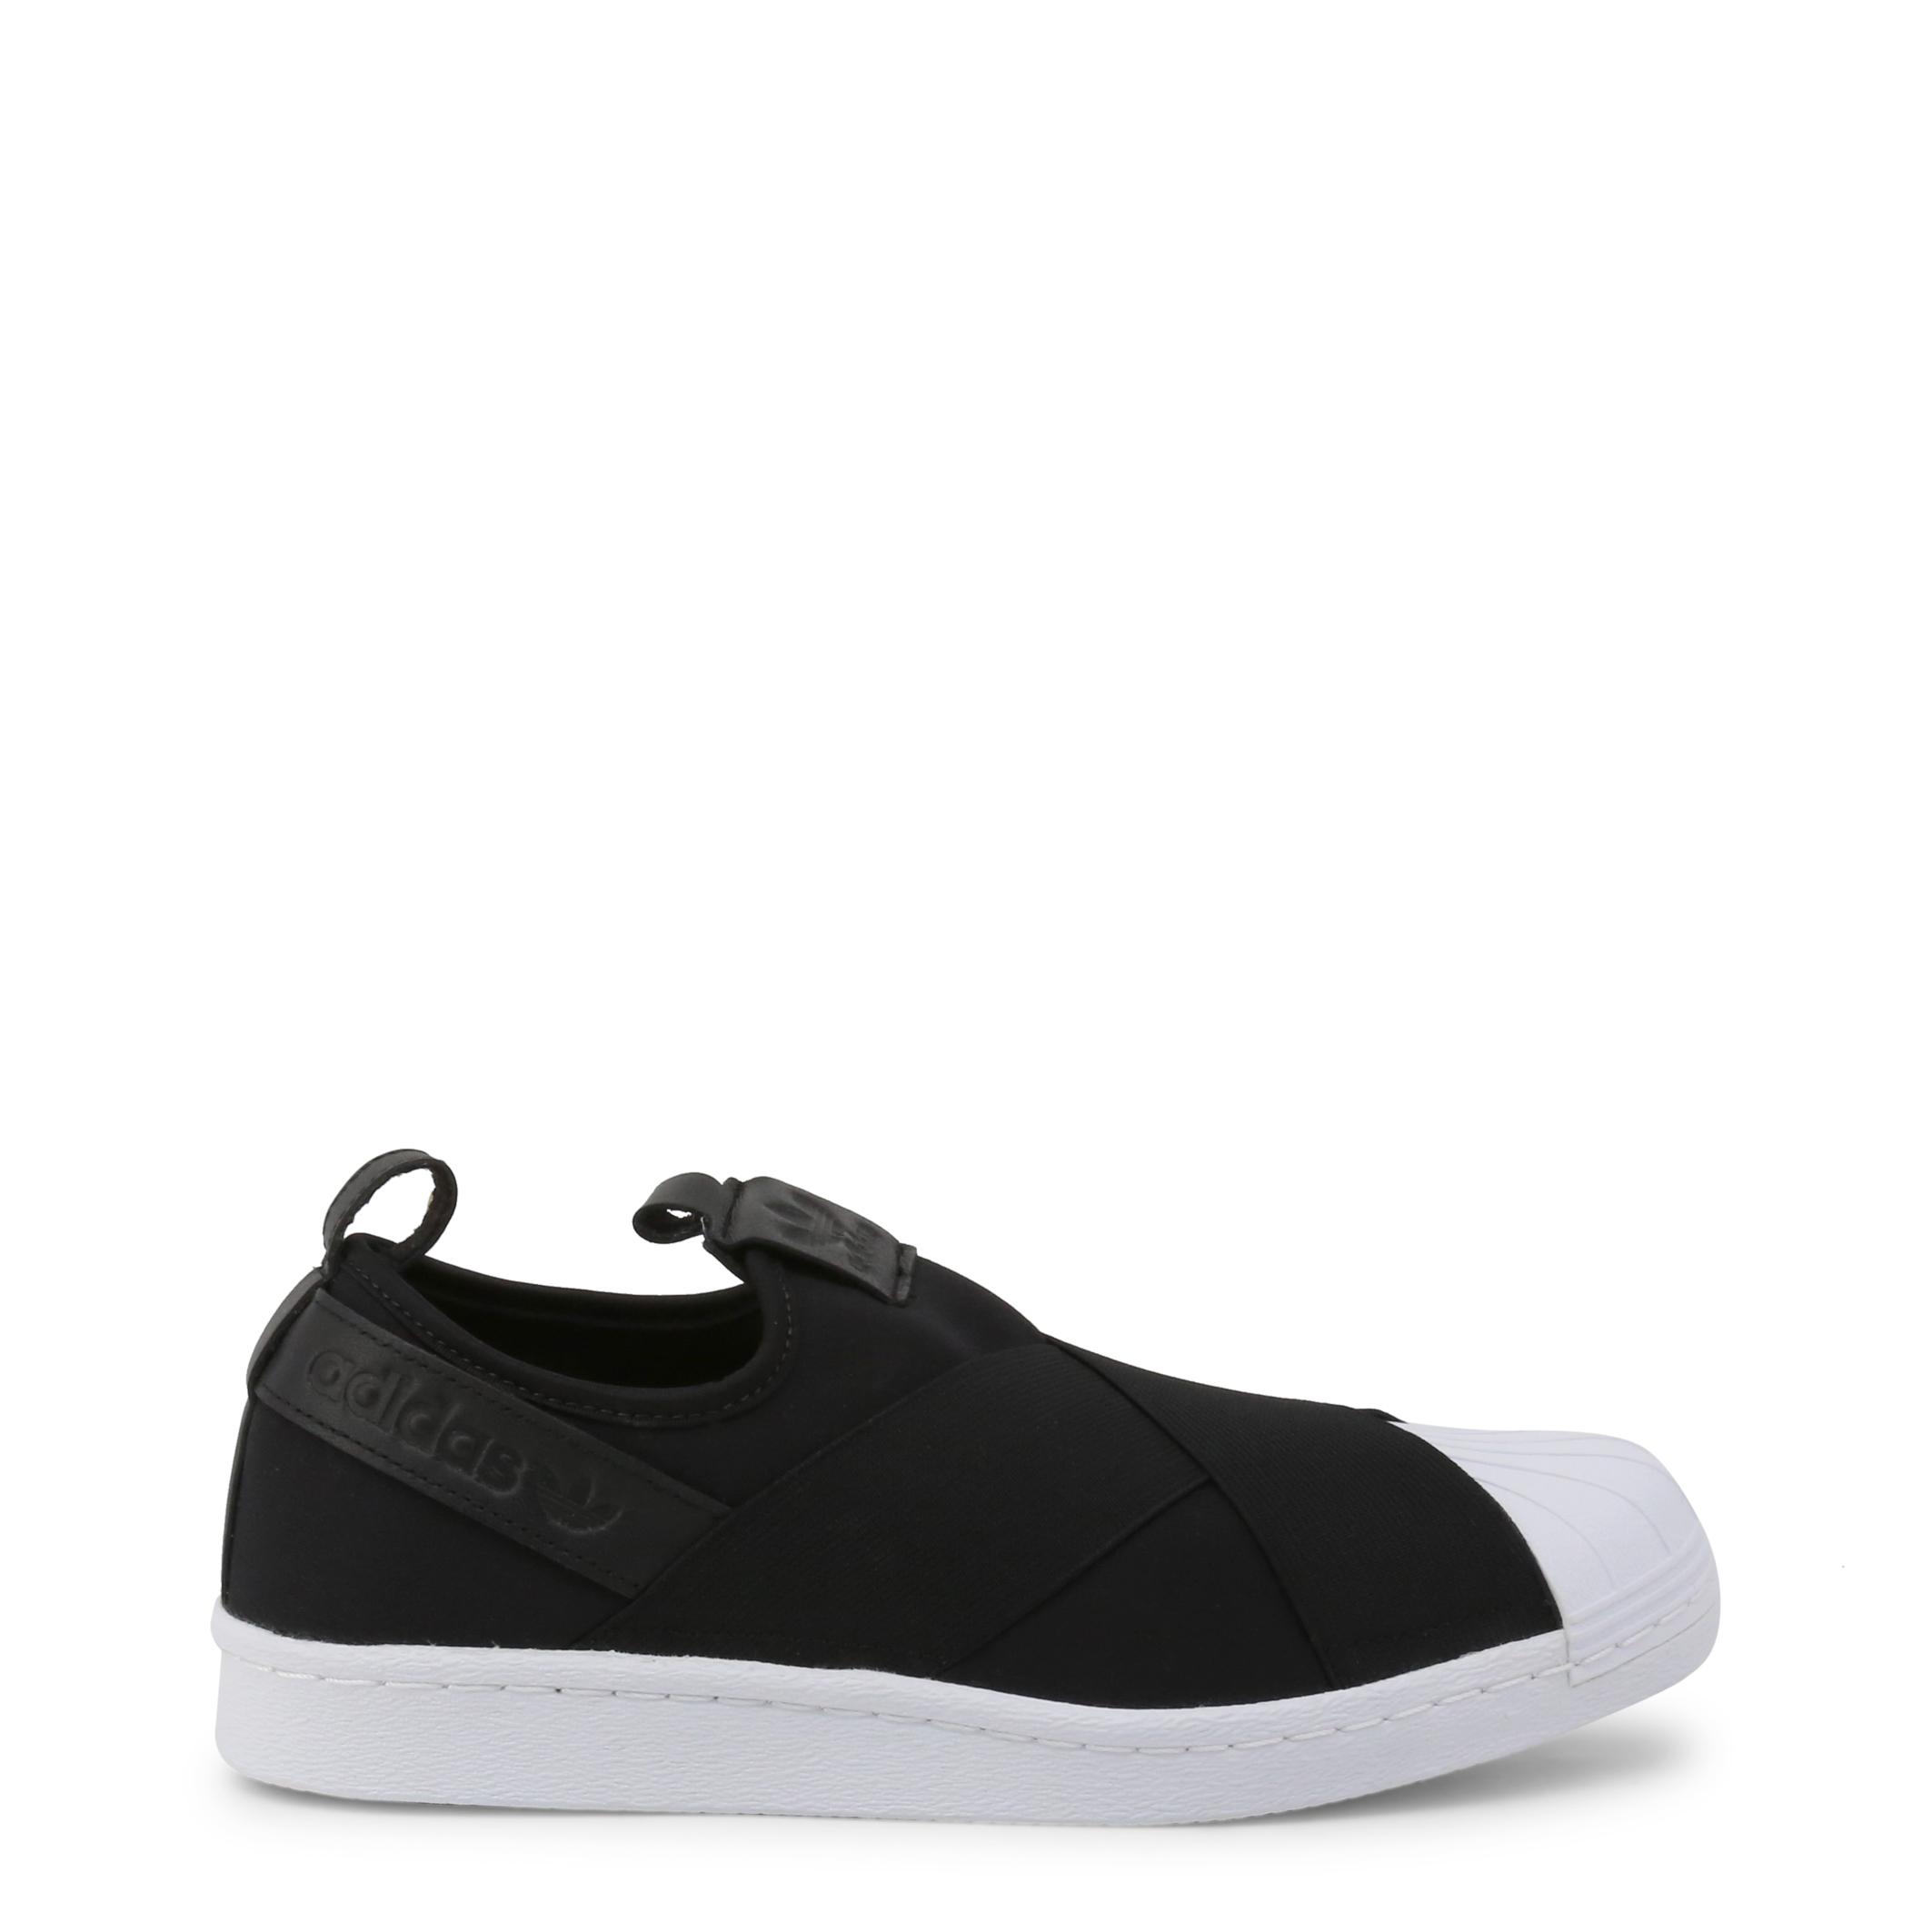 Chaussures   Adidas Superstar-Slipon black